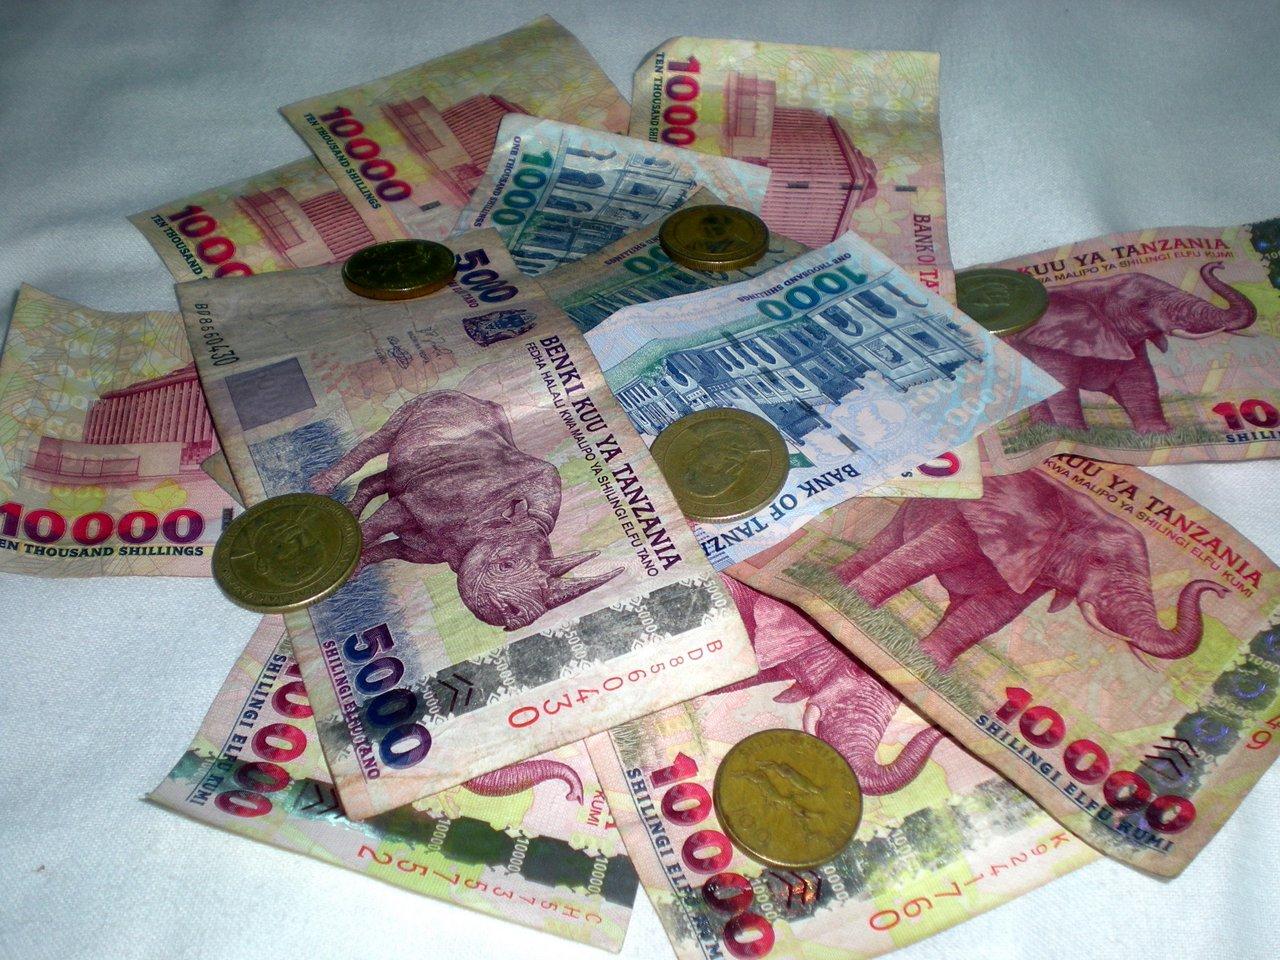 zanzibar fai da te: soldi carte e prelievi